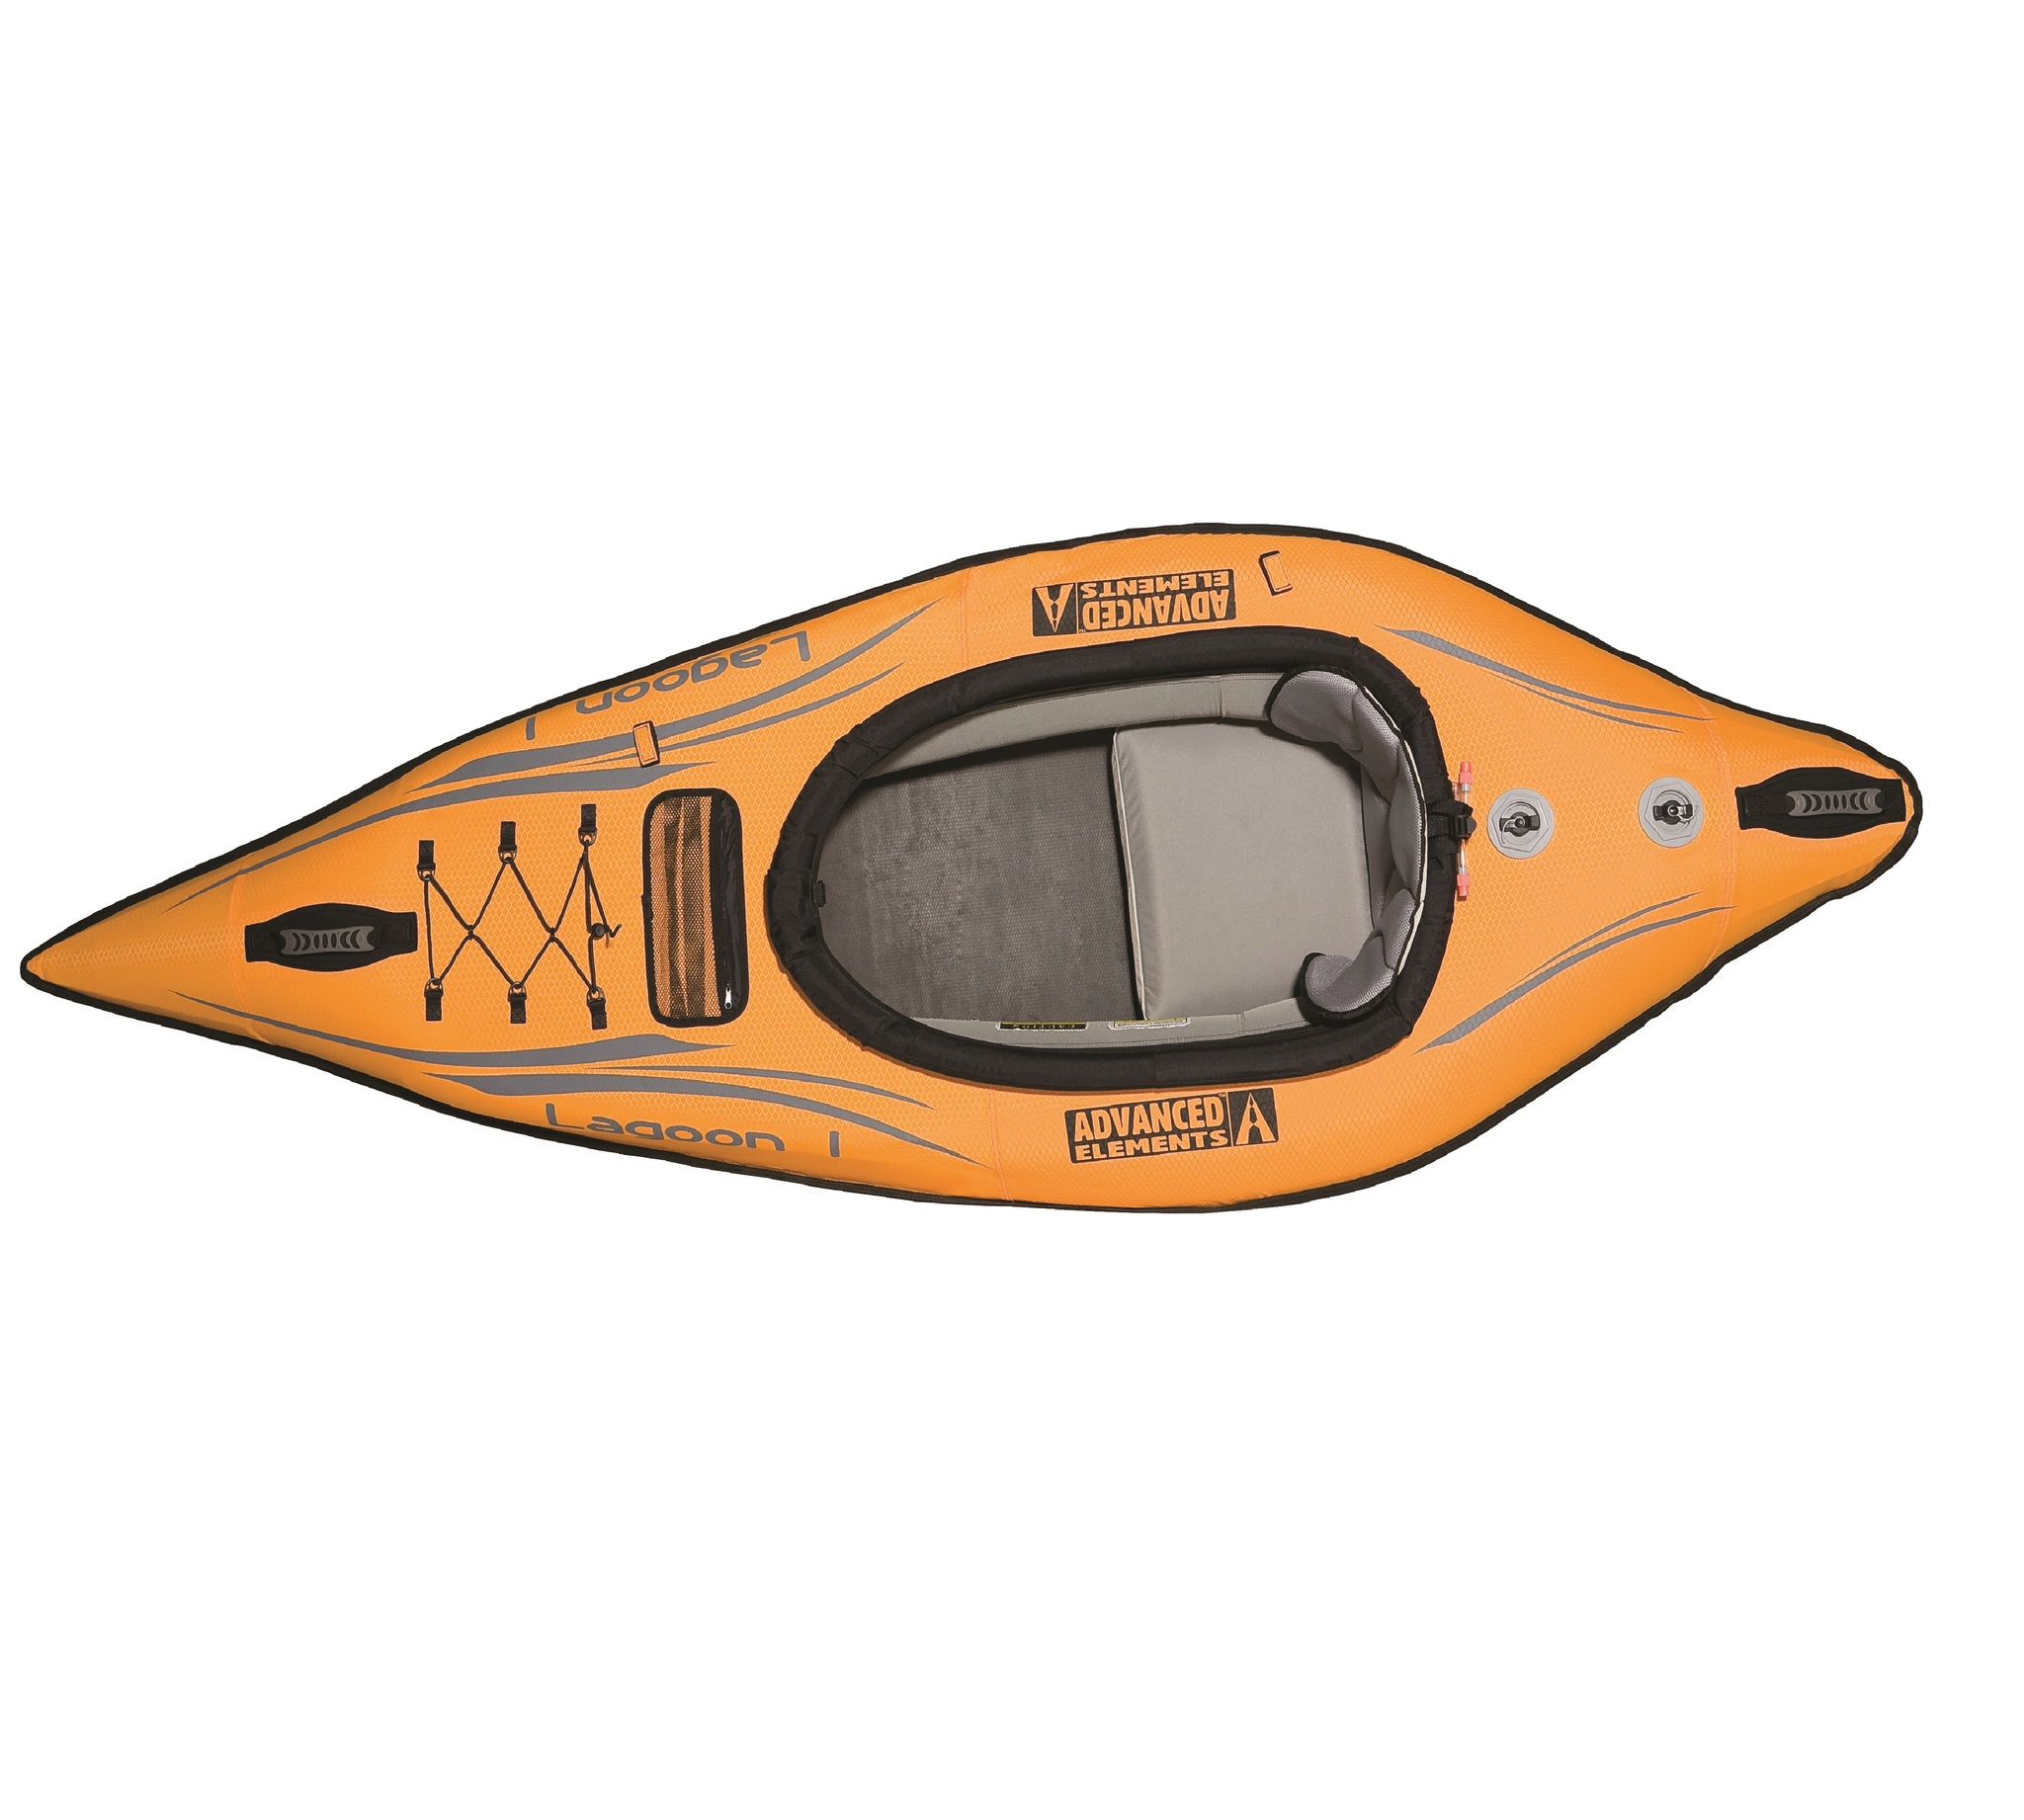 Recreational inflatable kayak Lagoon 1™, single